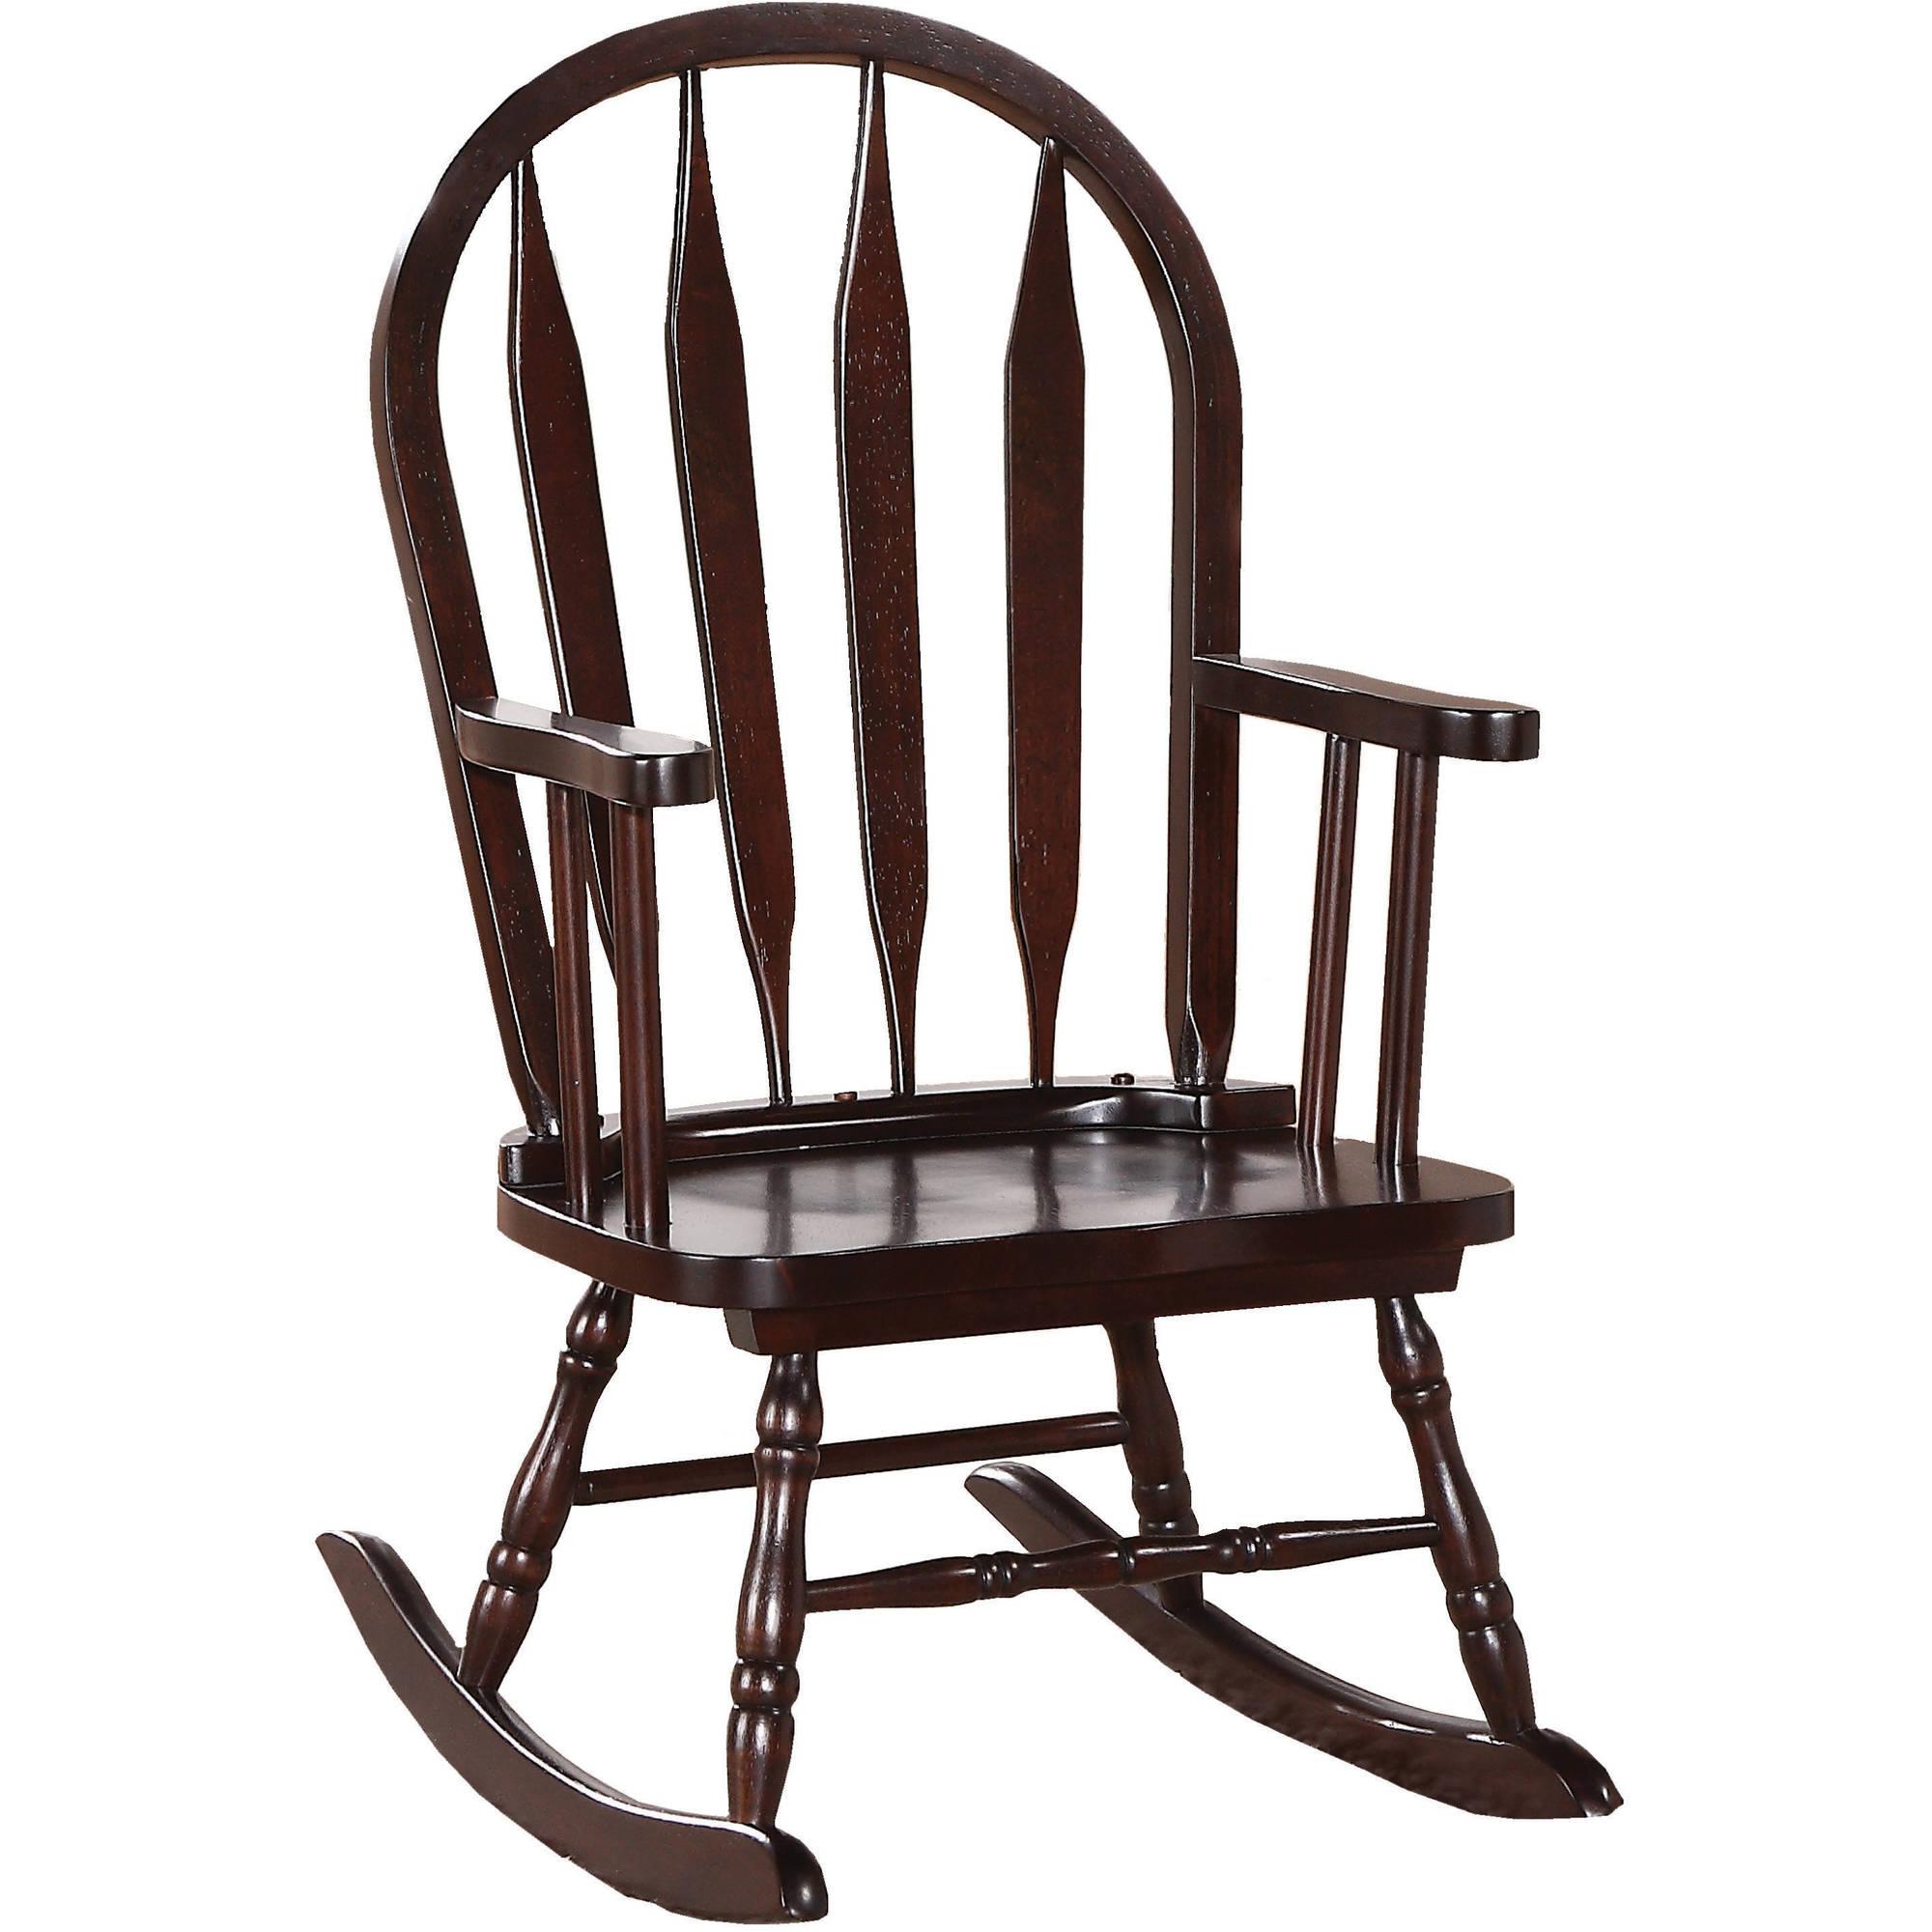 Juvenile Arrow Back Rocking Chair, Cappuccino Throughout Cappuccino Curved Rocking Chairs (#10 of 20)